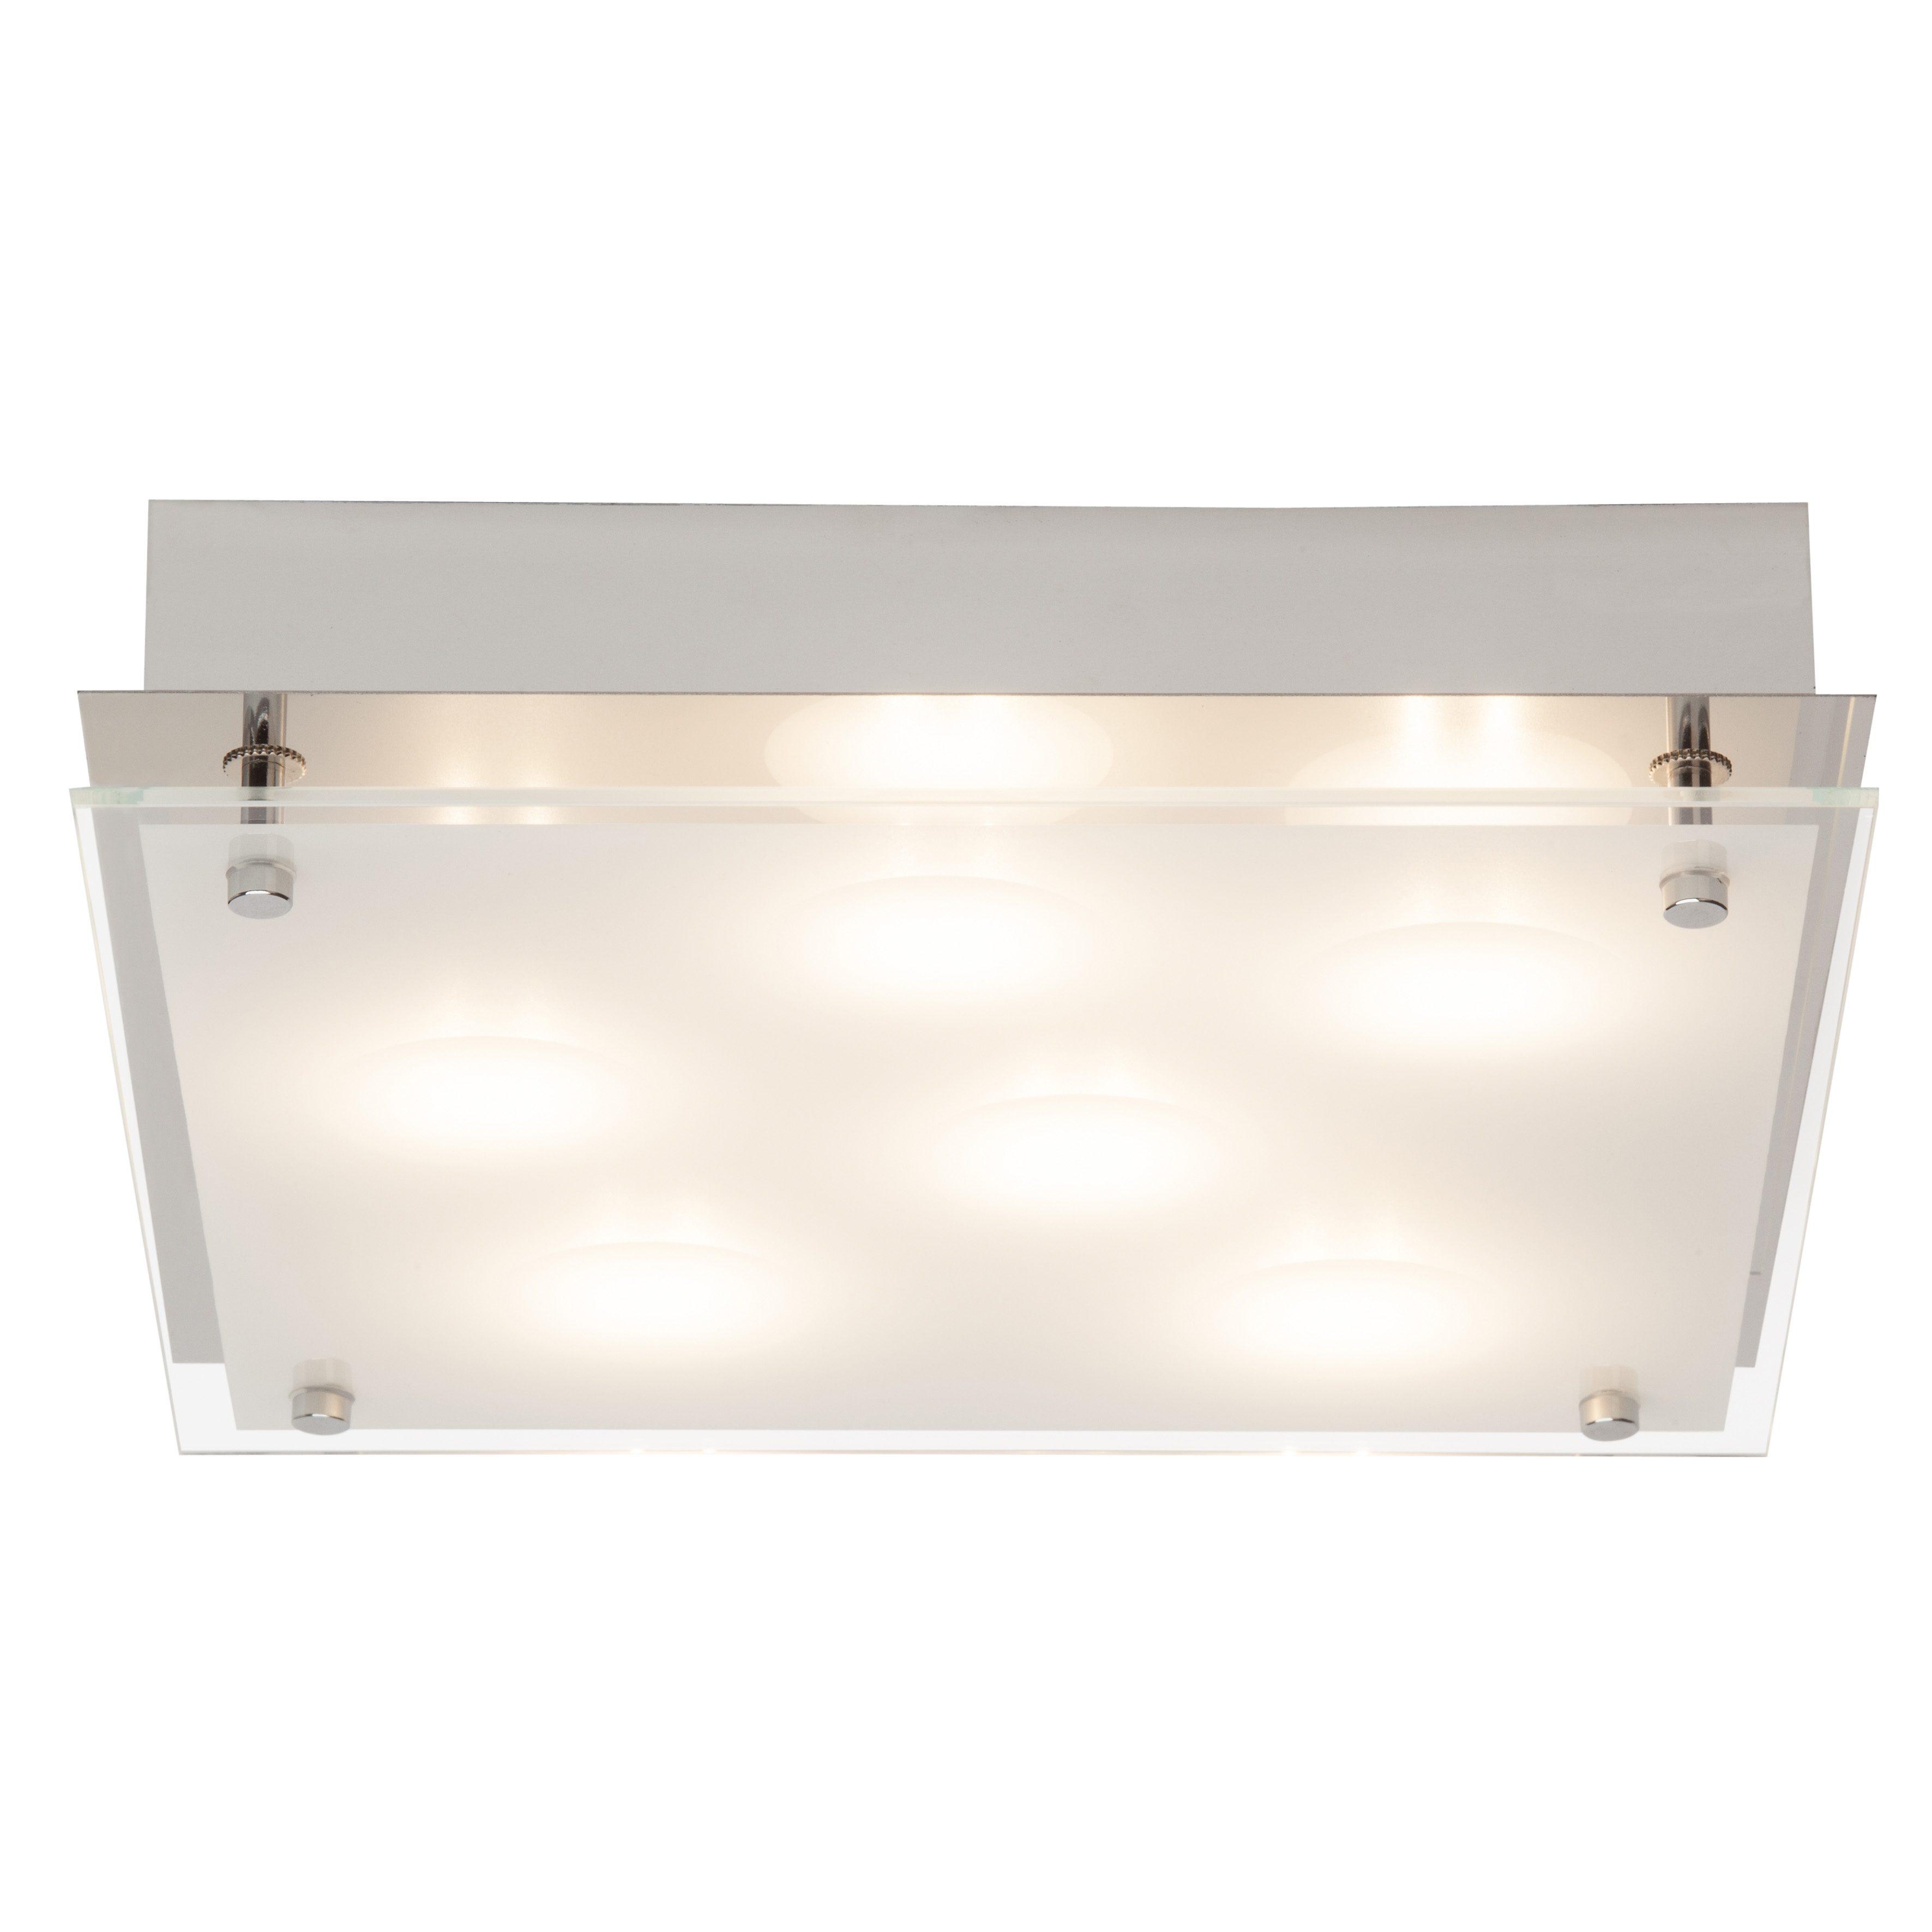 Brilliant Leuchten LED-Deckenleuchte, inkl. LED-Leuchtmittel, 6 flammig